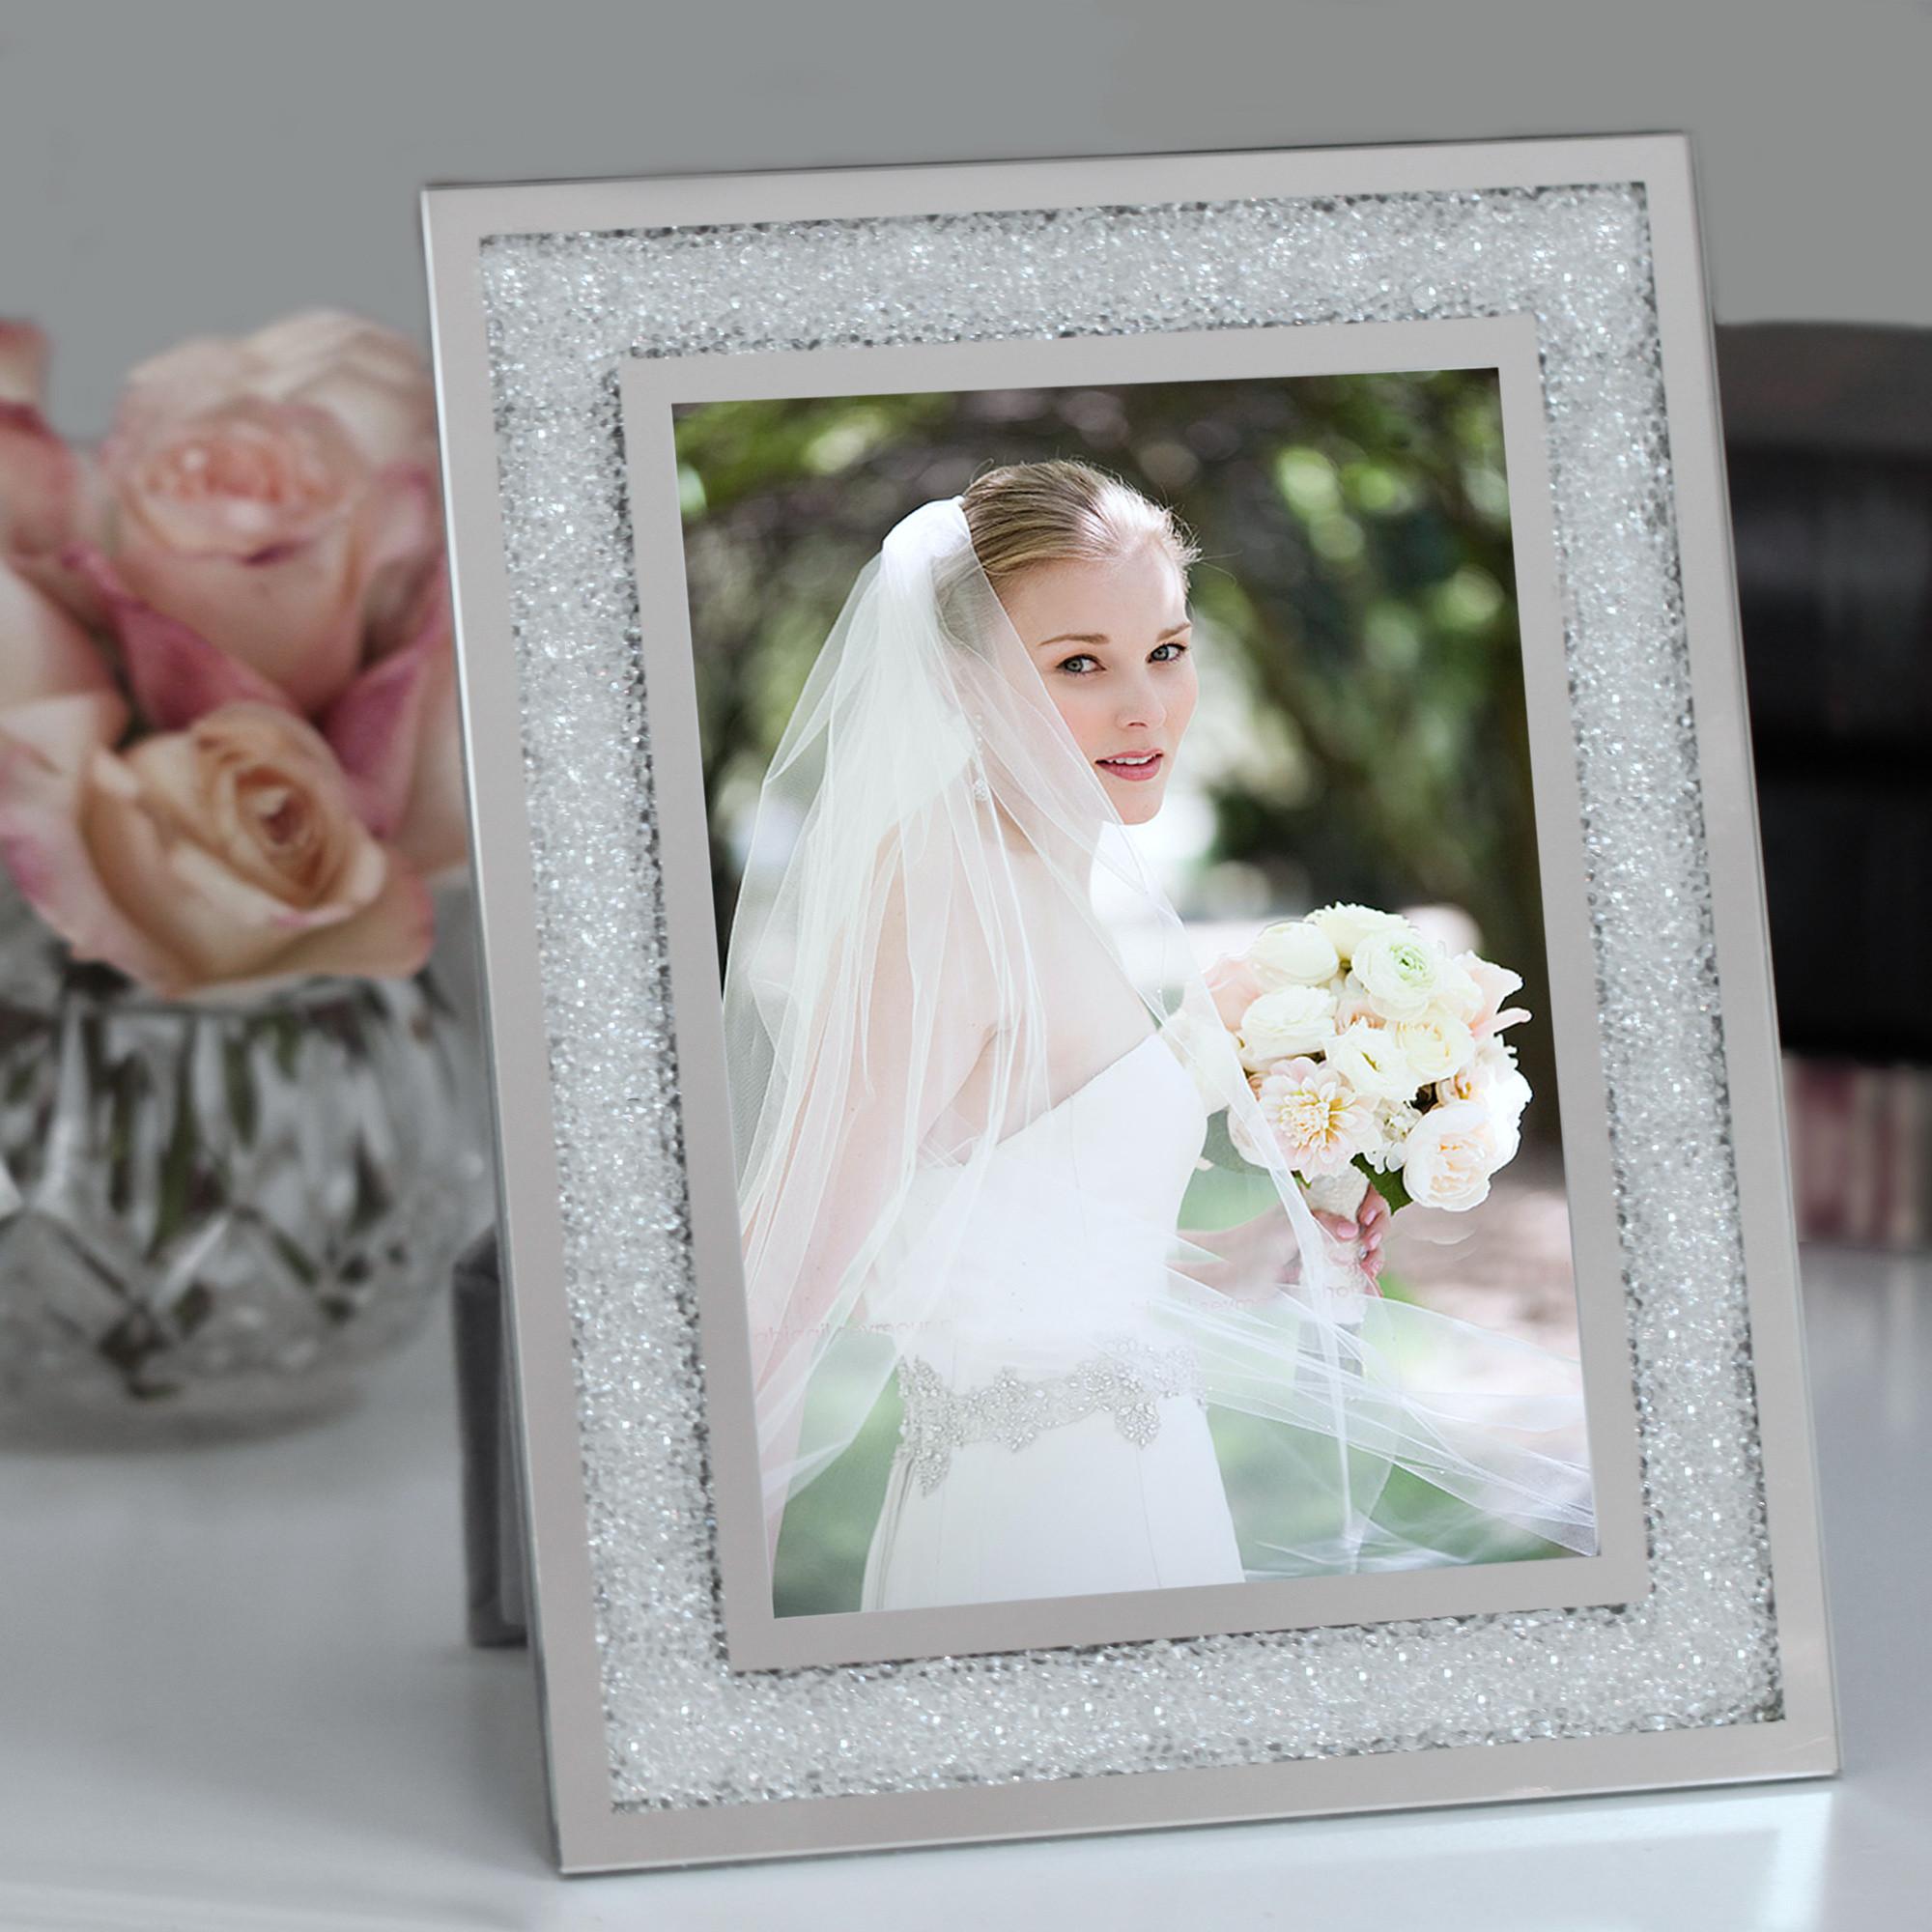 Crystal Wedding Frames Personalized - Best Frames 2018